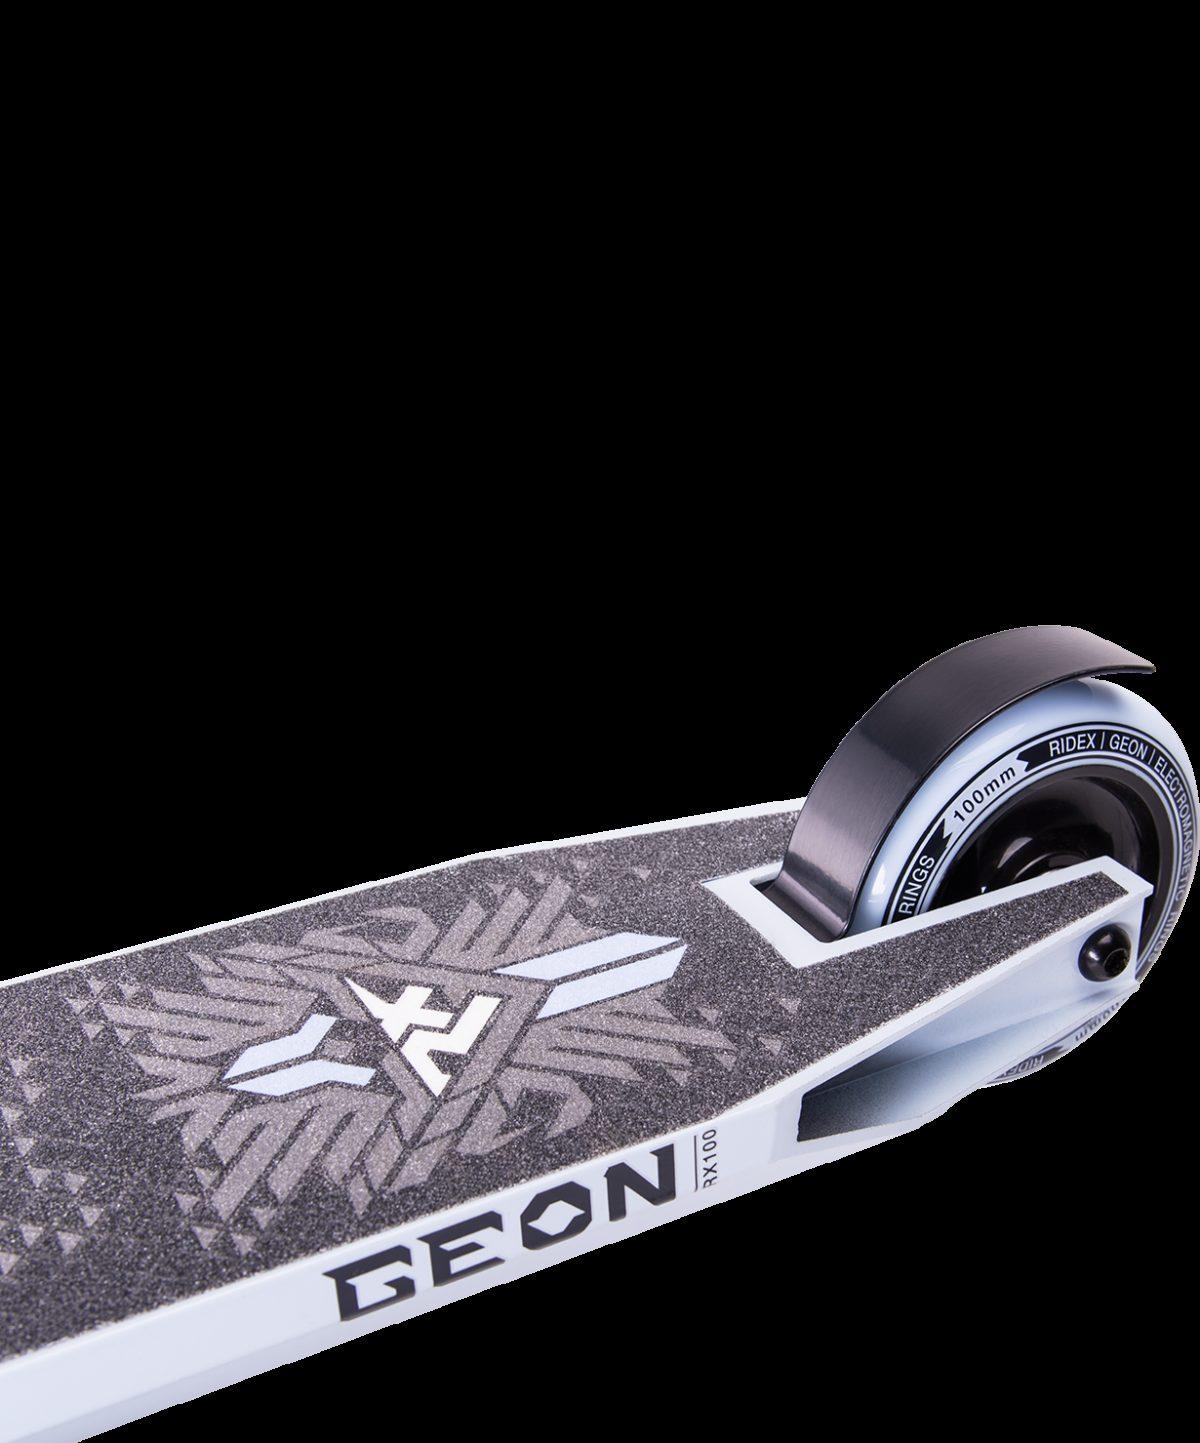 RIDEX Geon White самокат трюковый 100 мм - 4